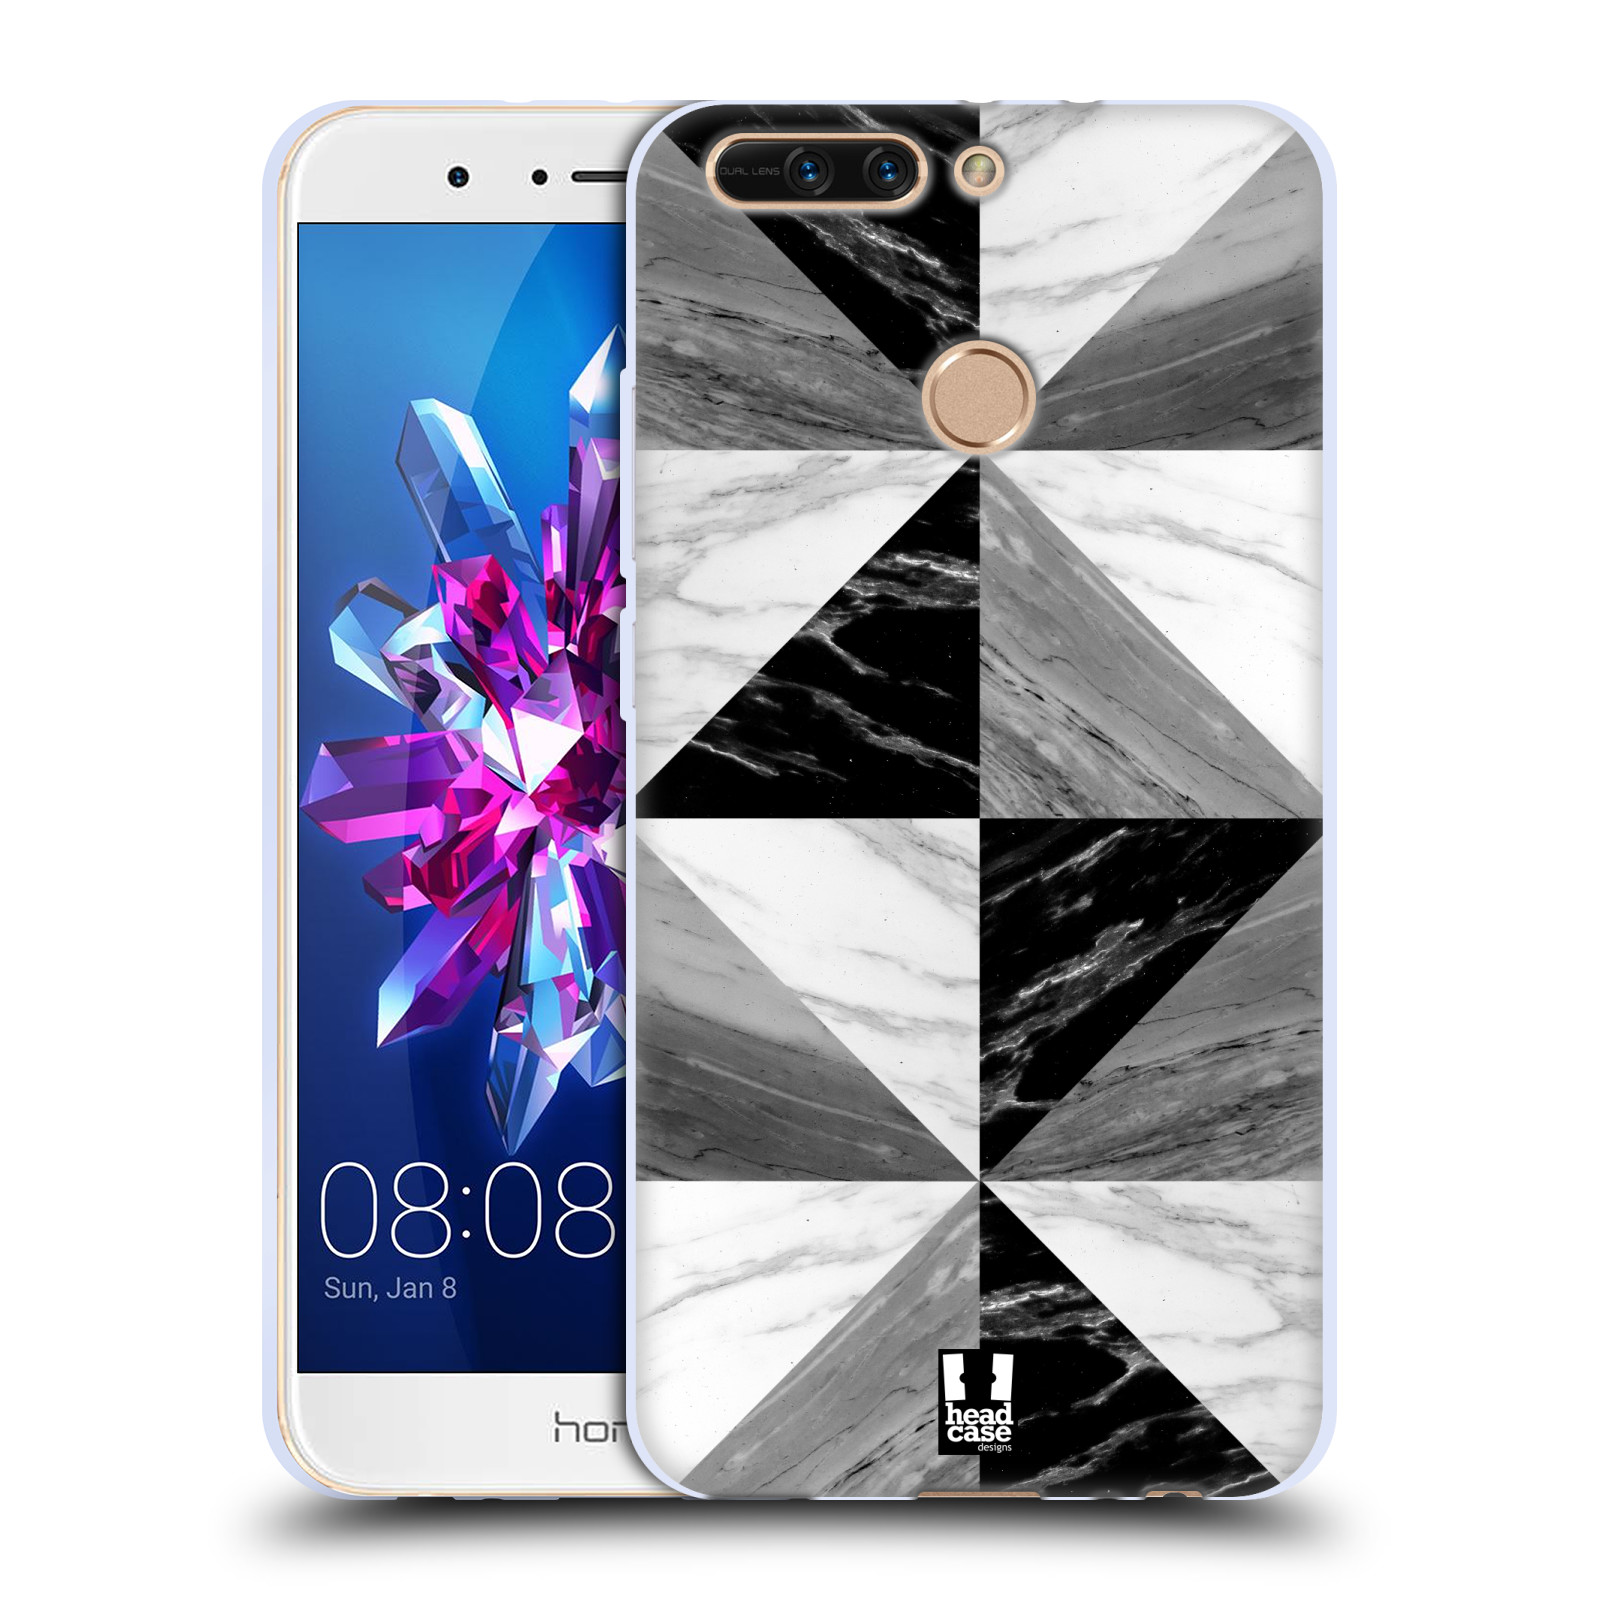 Silikonové pouzdro na mobil Honor 8 Pro - Head Case - Mramor triangl